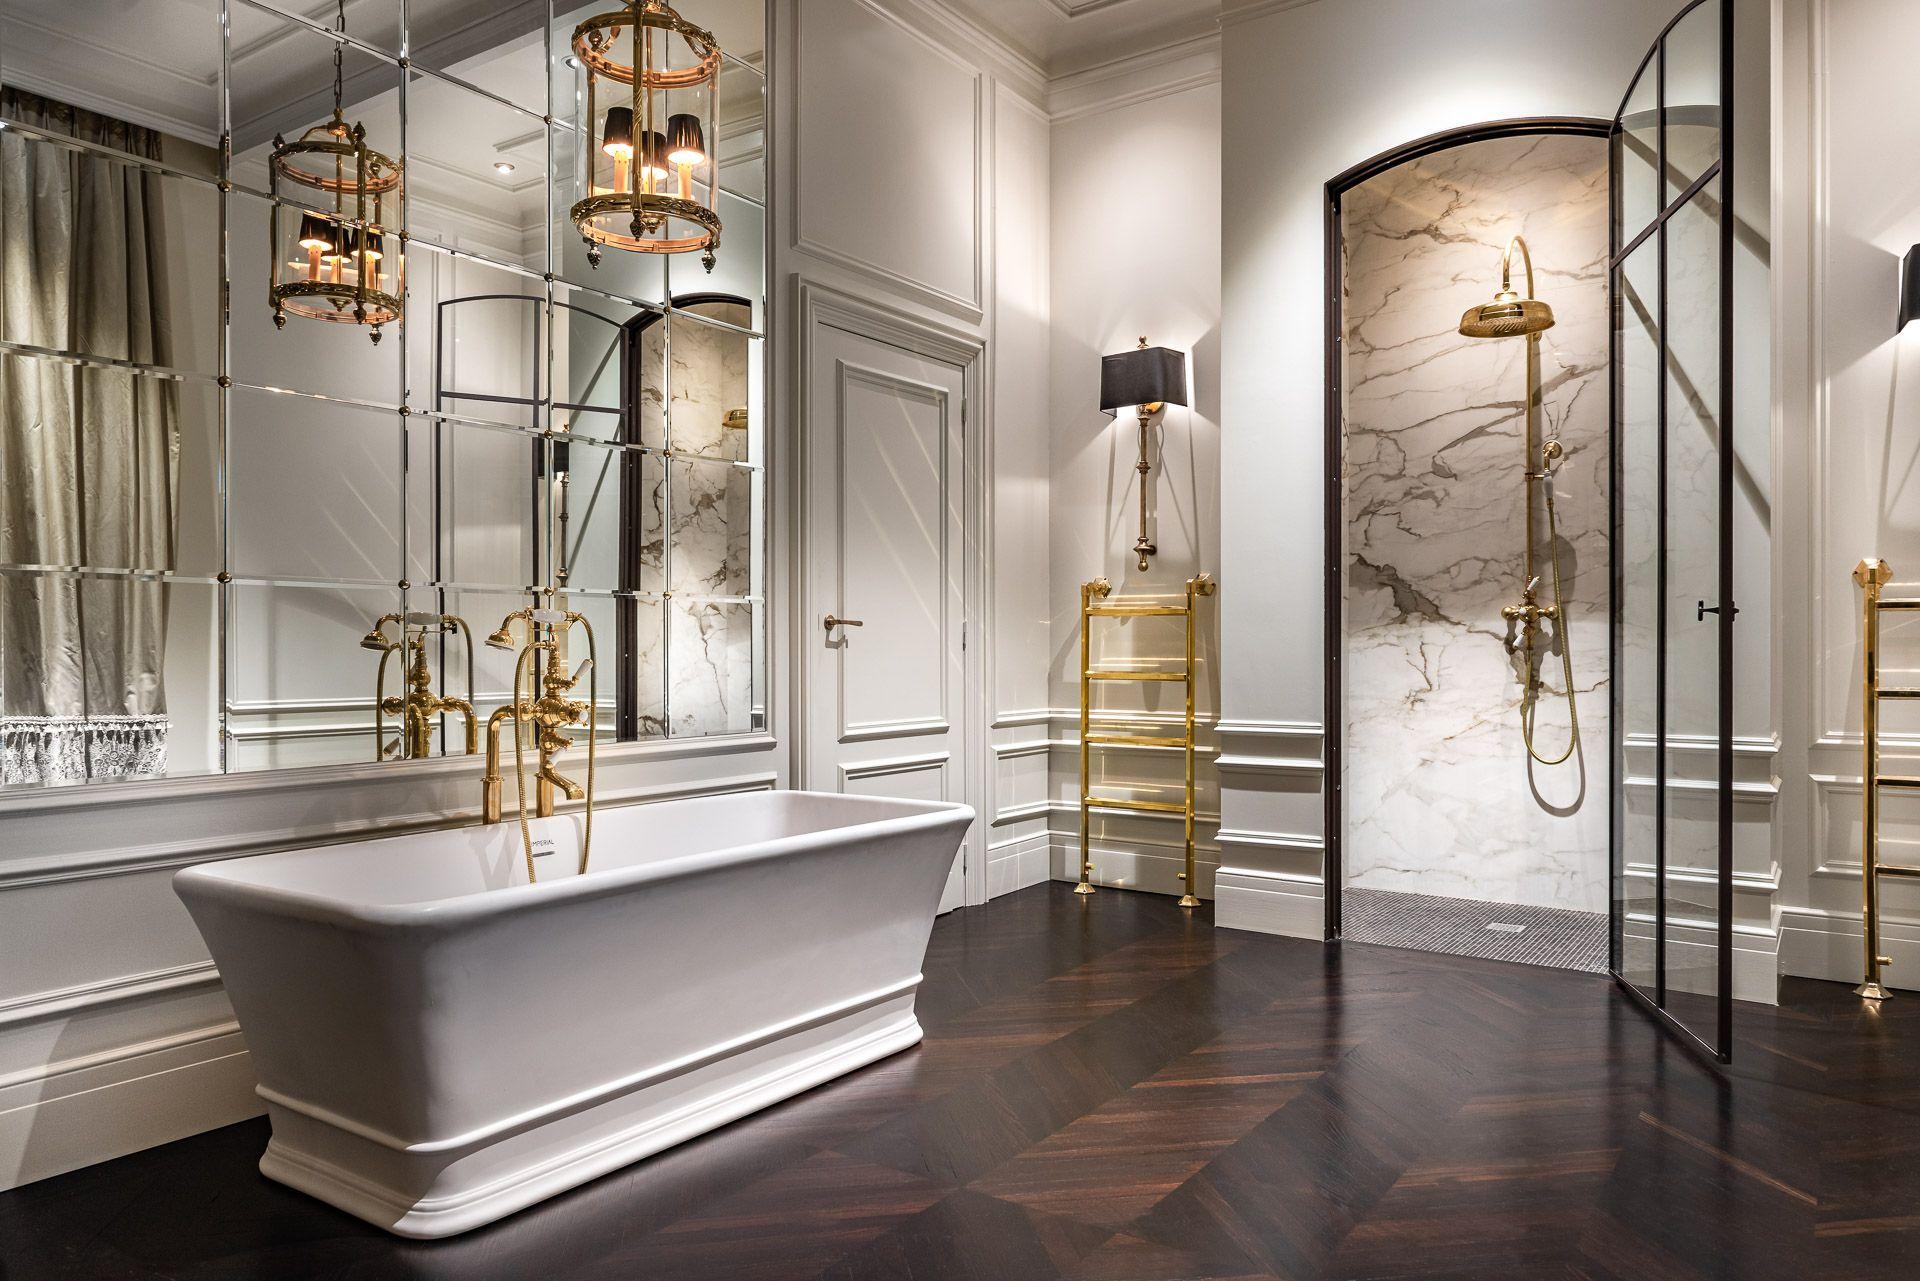 Showroom 4season Bathroom Messing Brass Luxe Bathroom Landelijke Badkamers Badkamer Badkamer Inspiratie